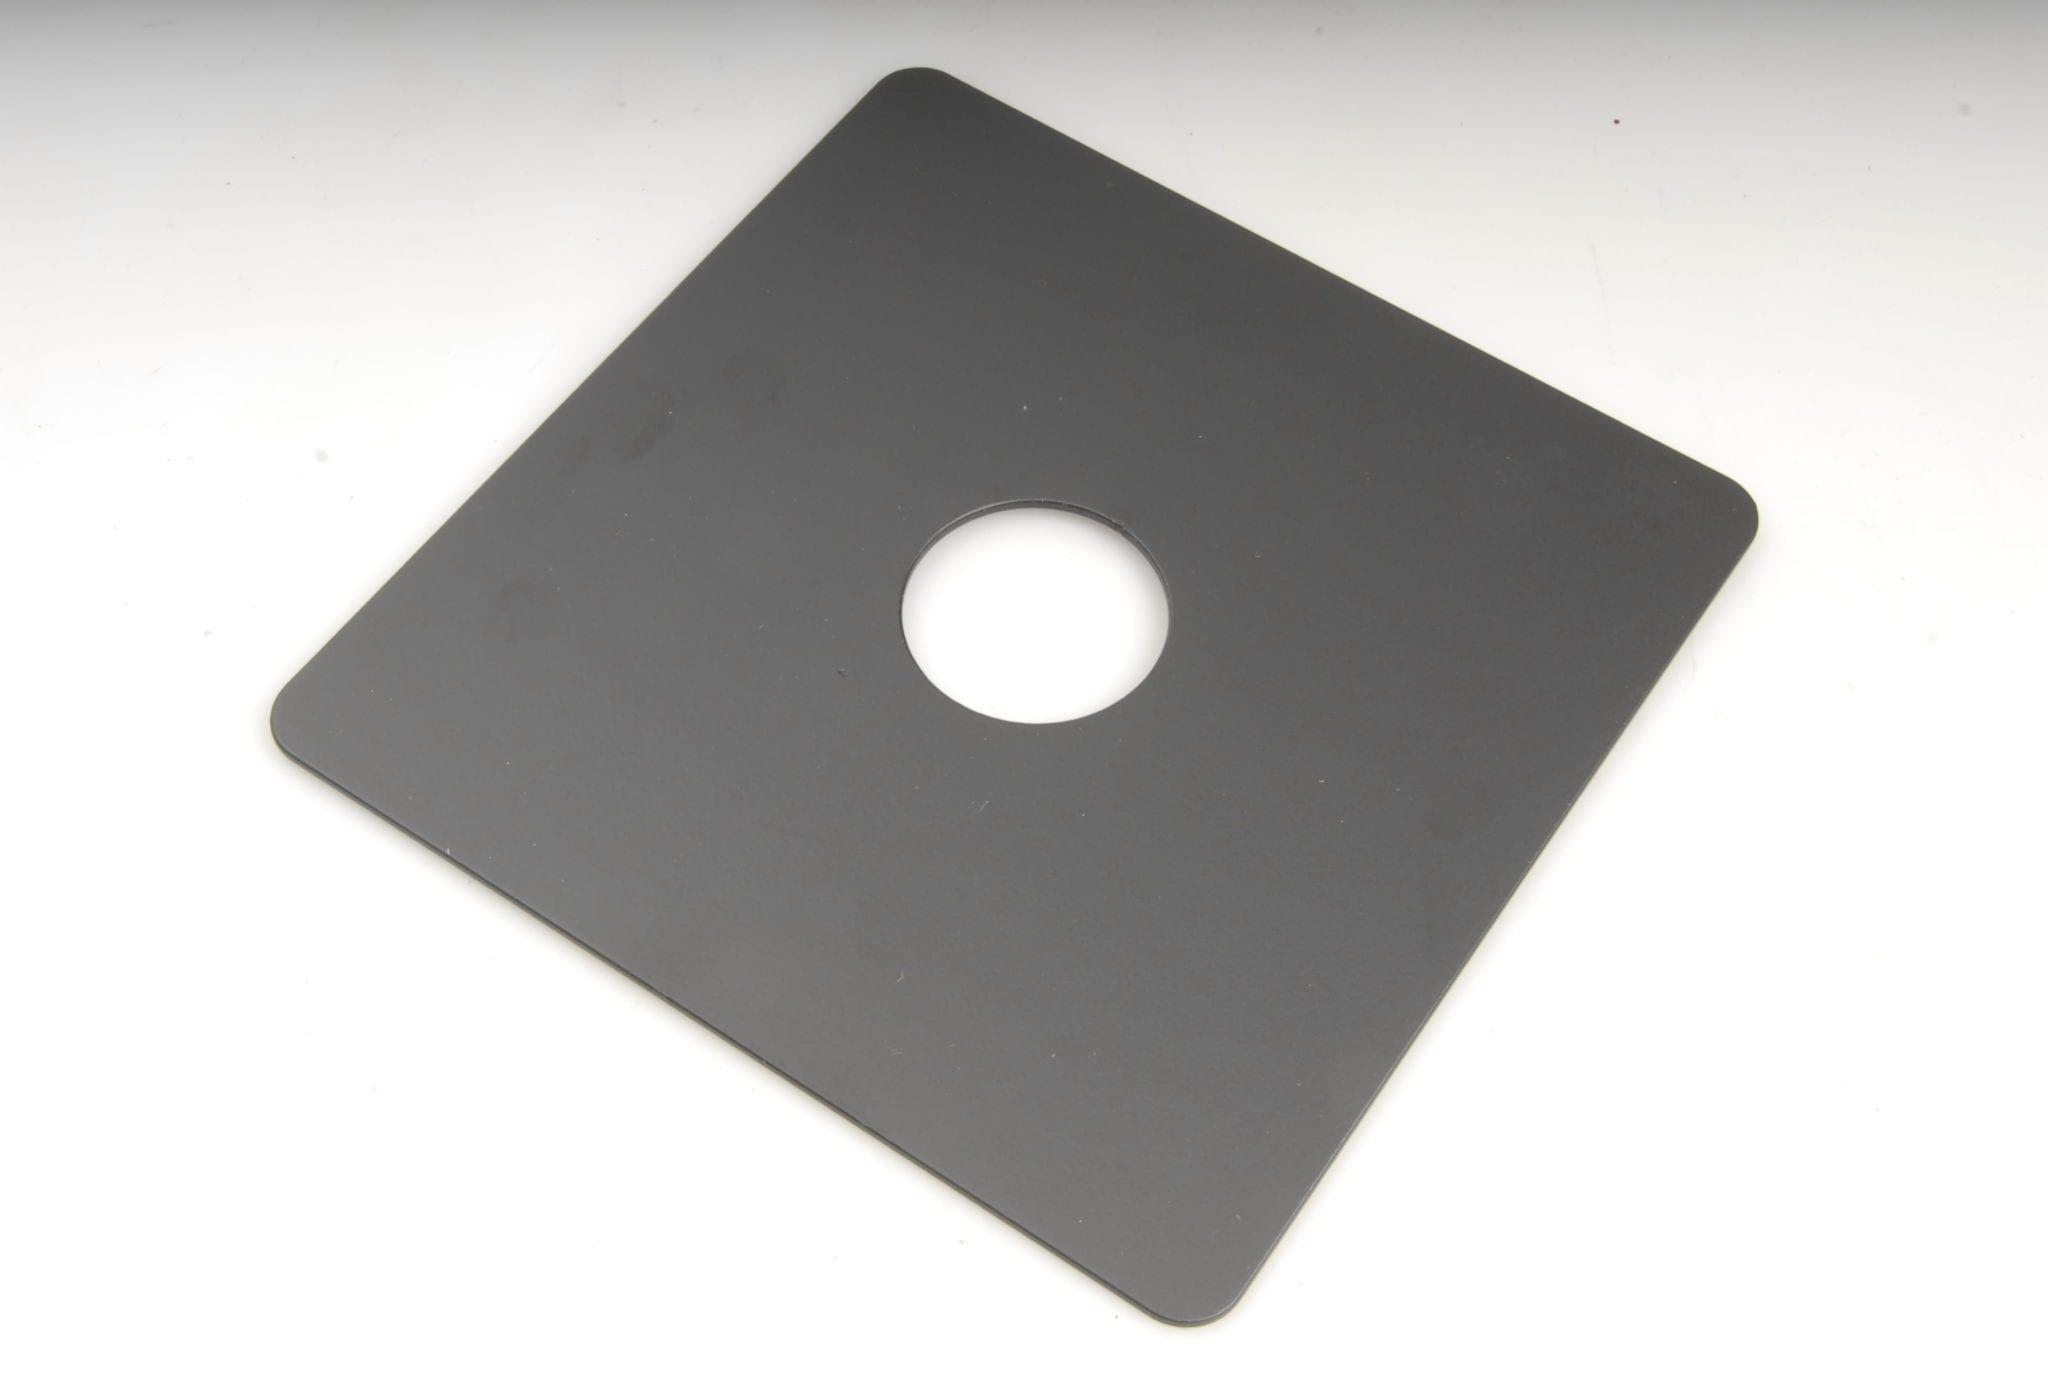 Arca Swiss 110x110 mm Lens Board Copal #3 65mm